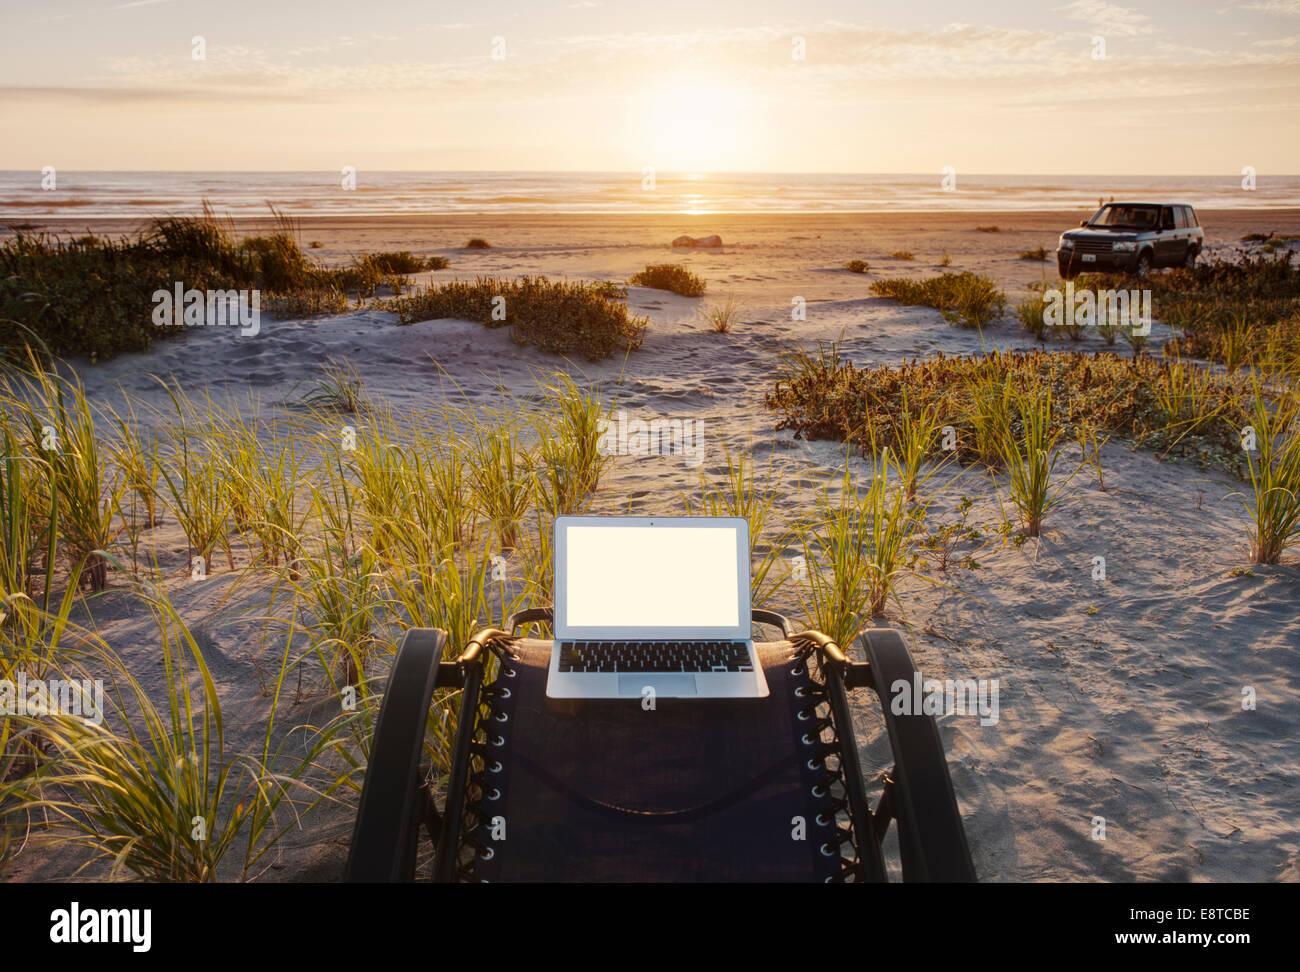 Laptop on deck chair overlooking sunset on beach - Stock Image